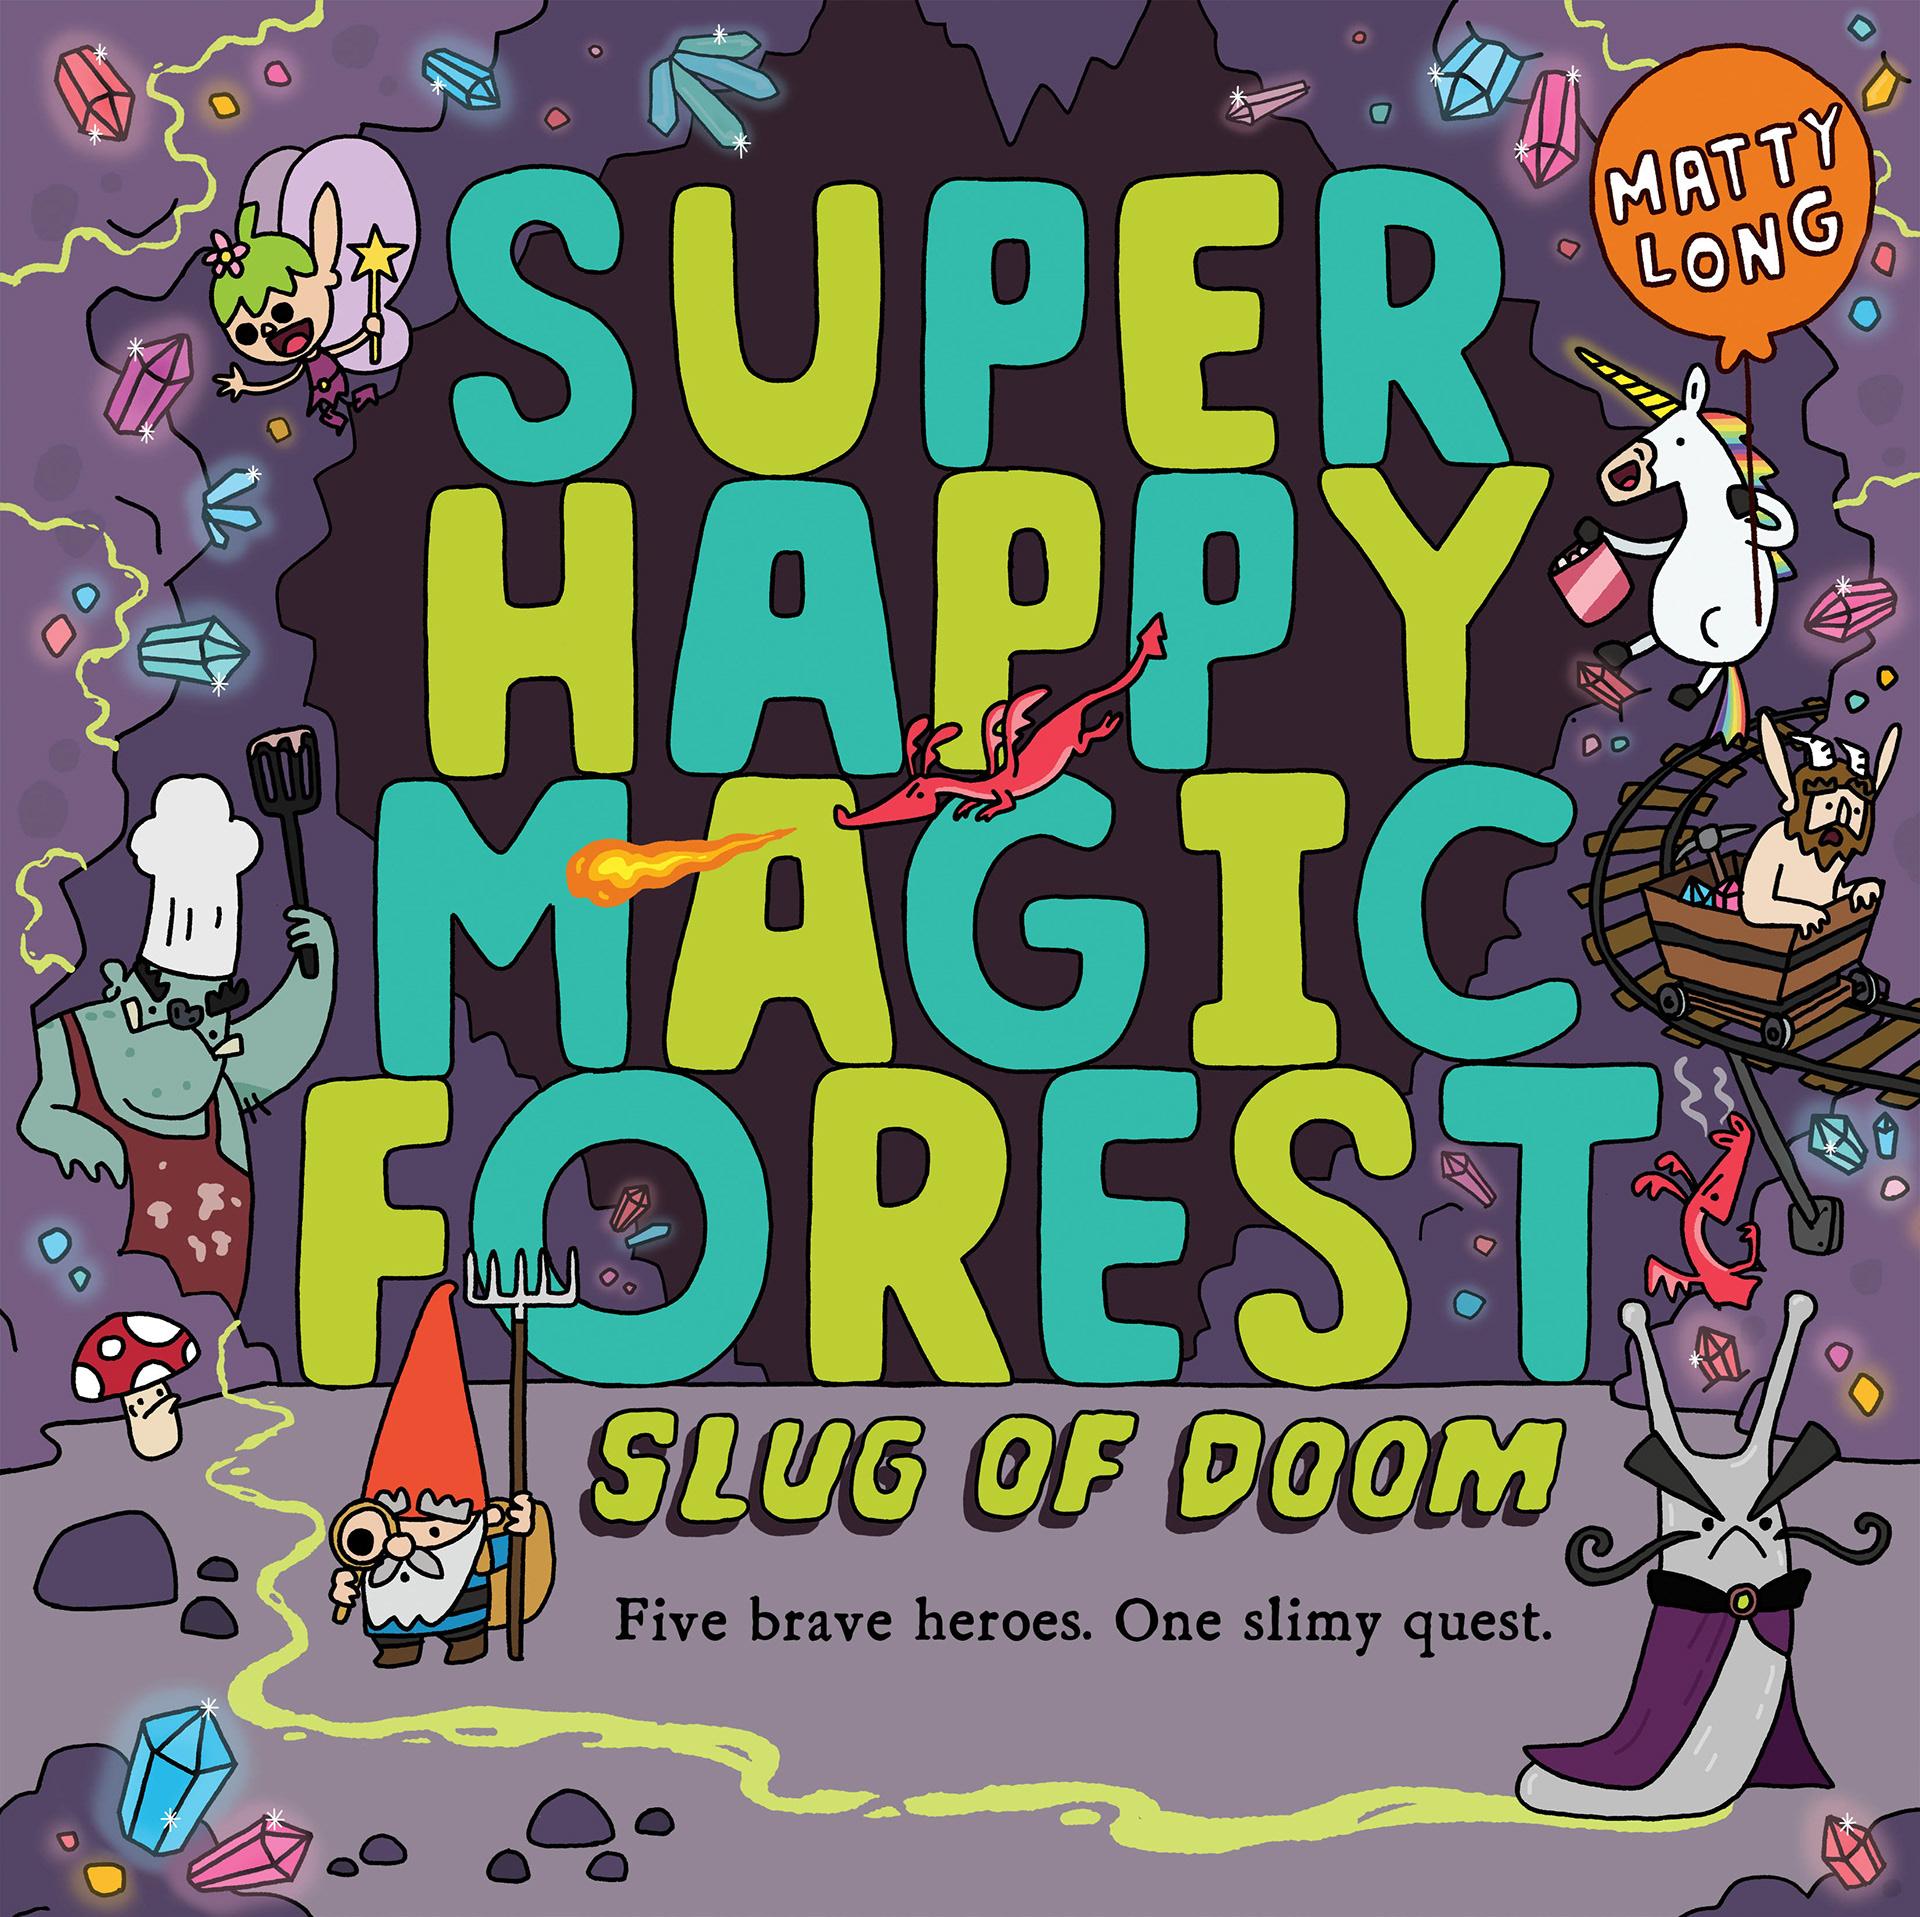 Matty Long - SUPER HAPPY MAGIC FOREST: SLUG OF DOOM